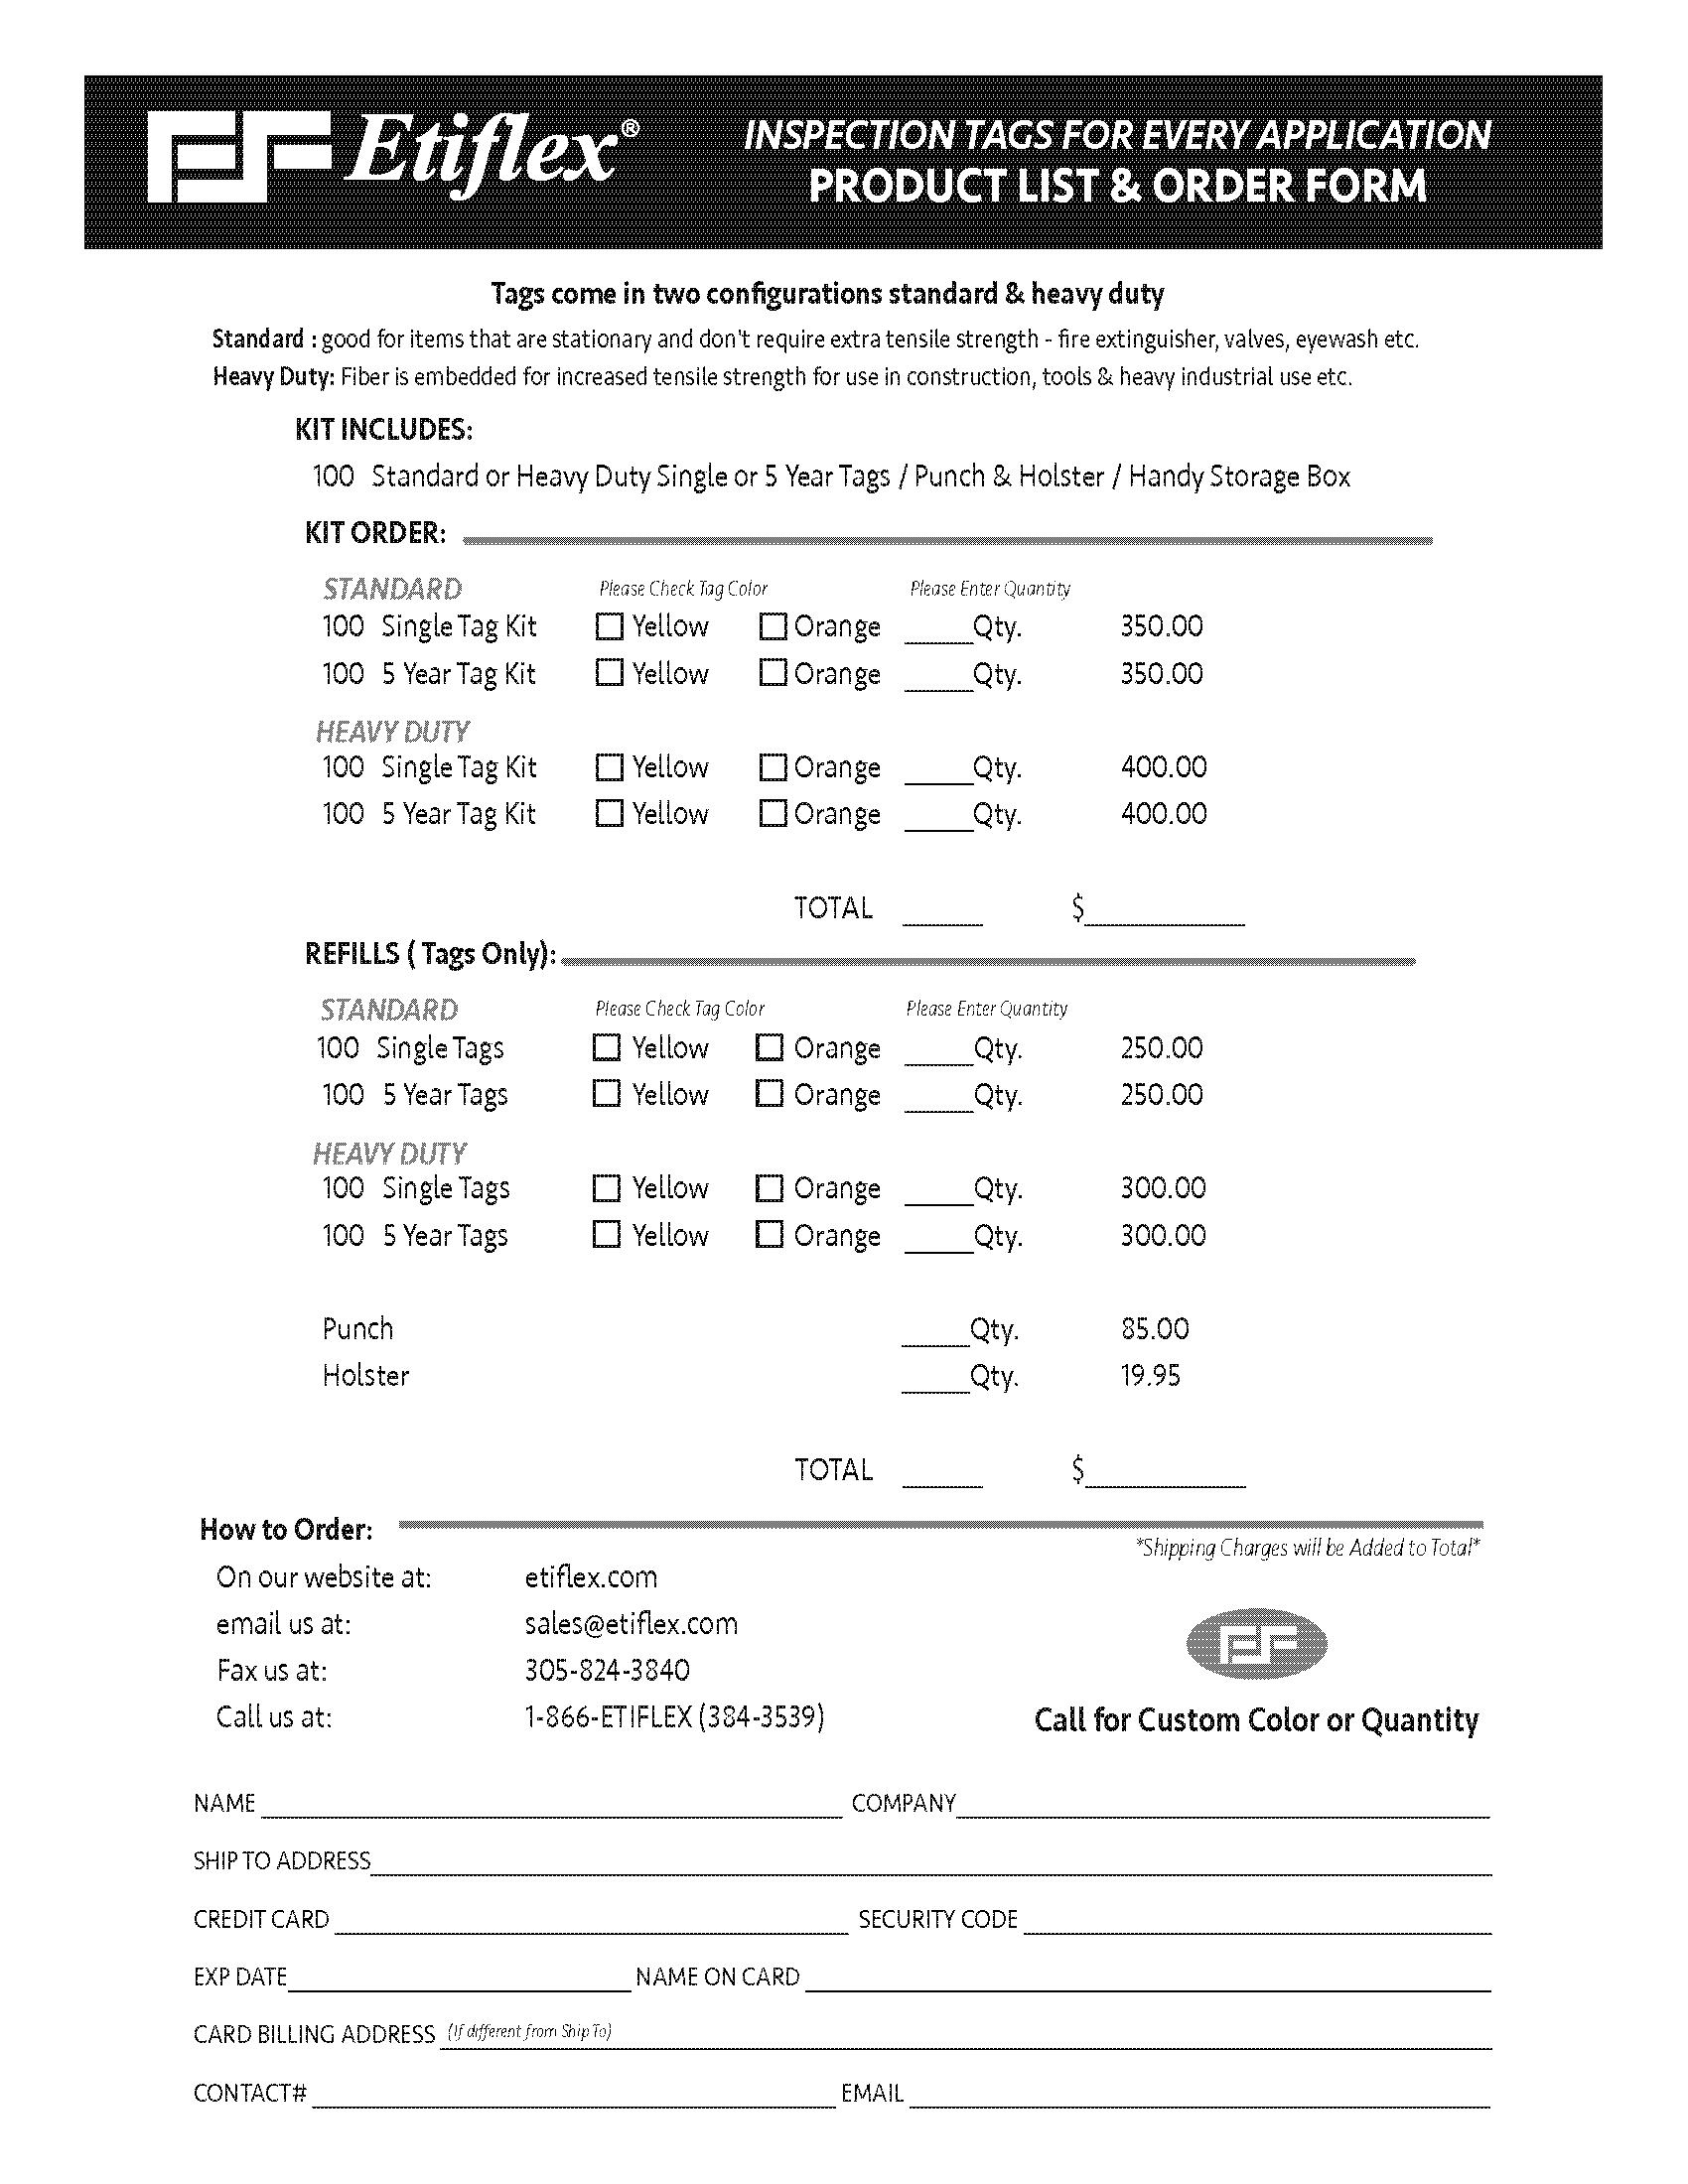 ETIFLEX insp kit order